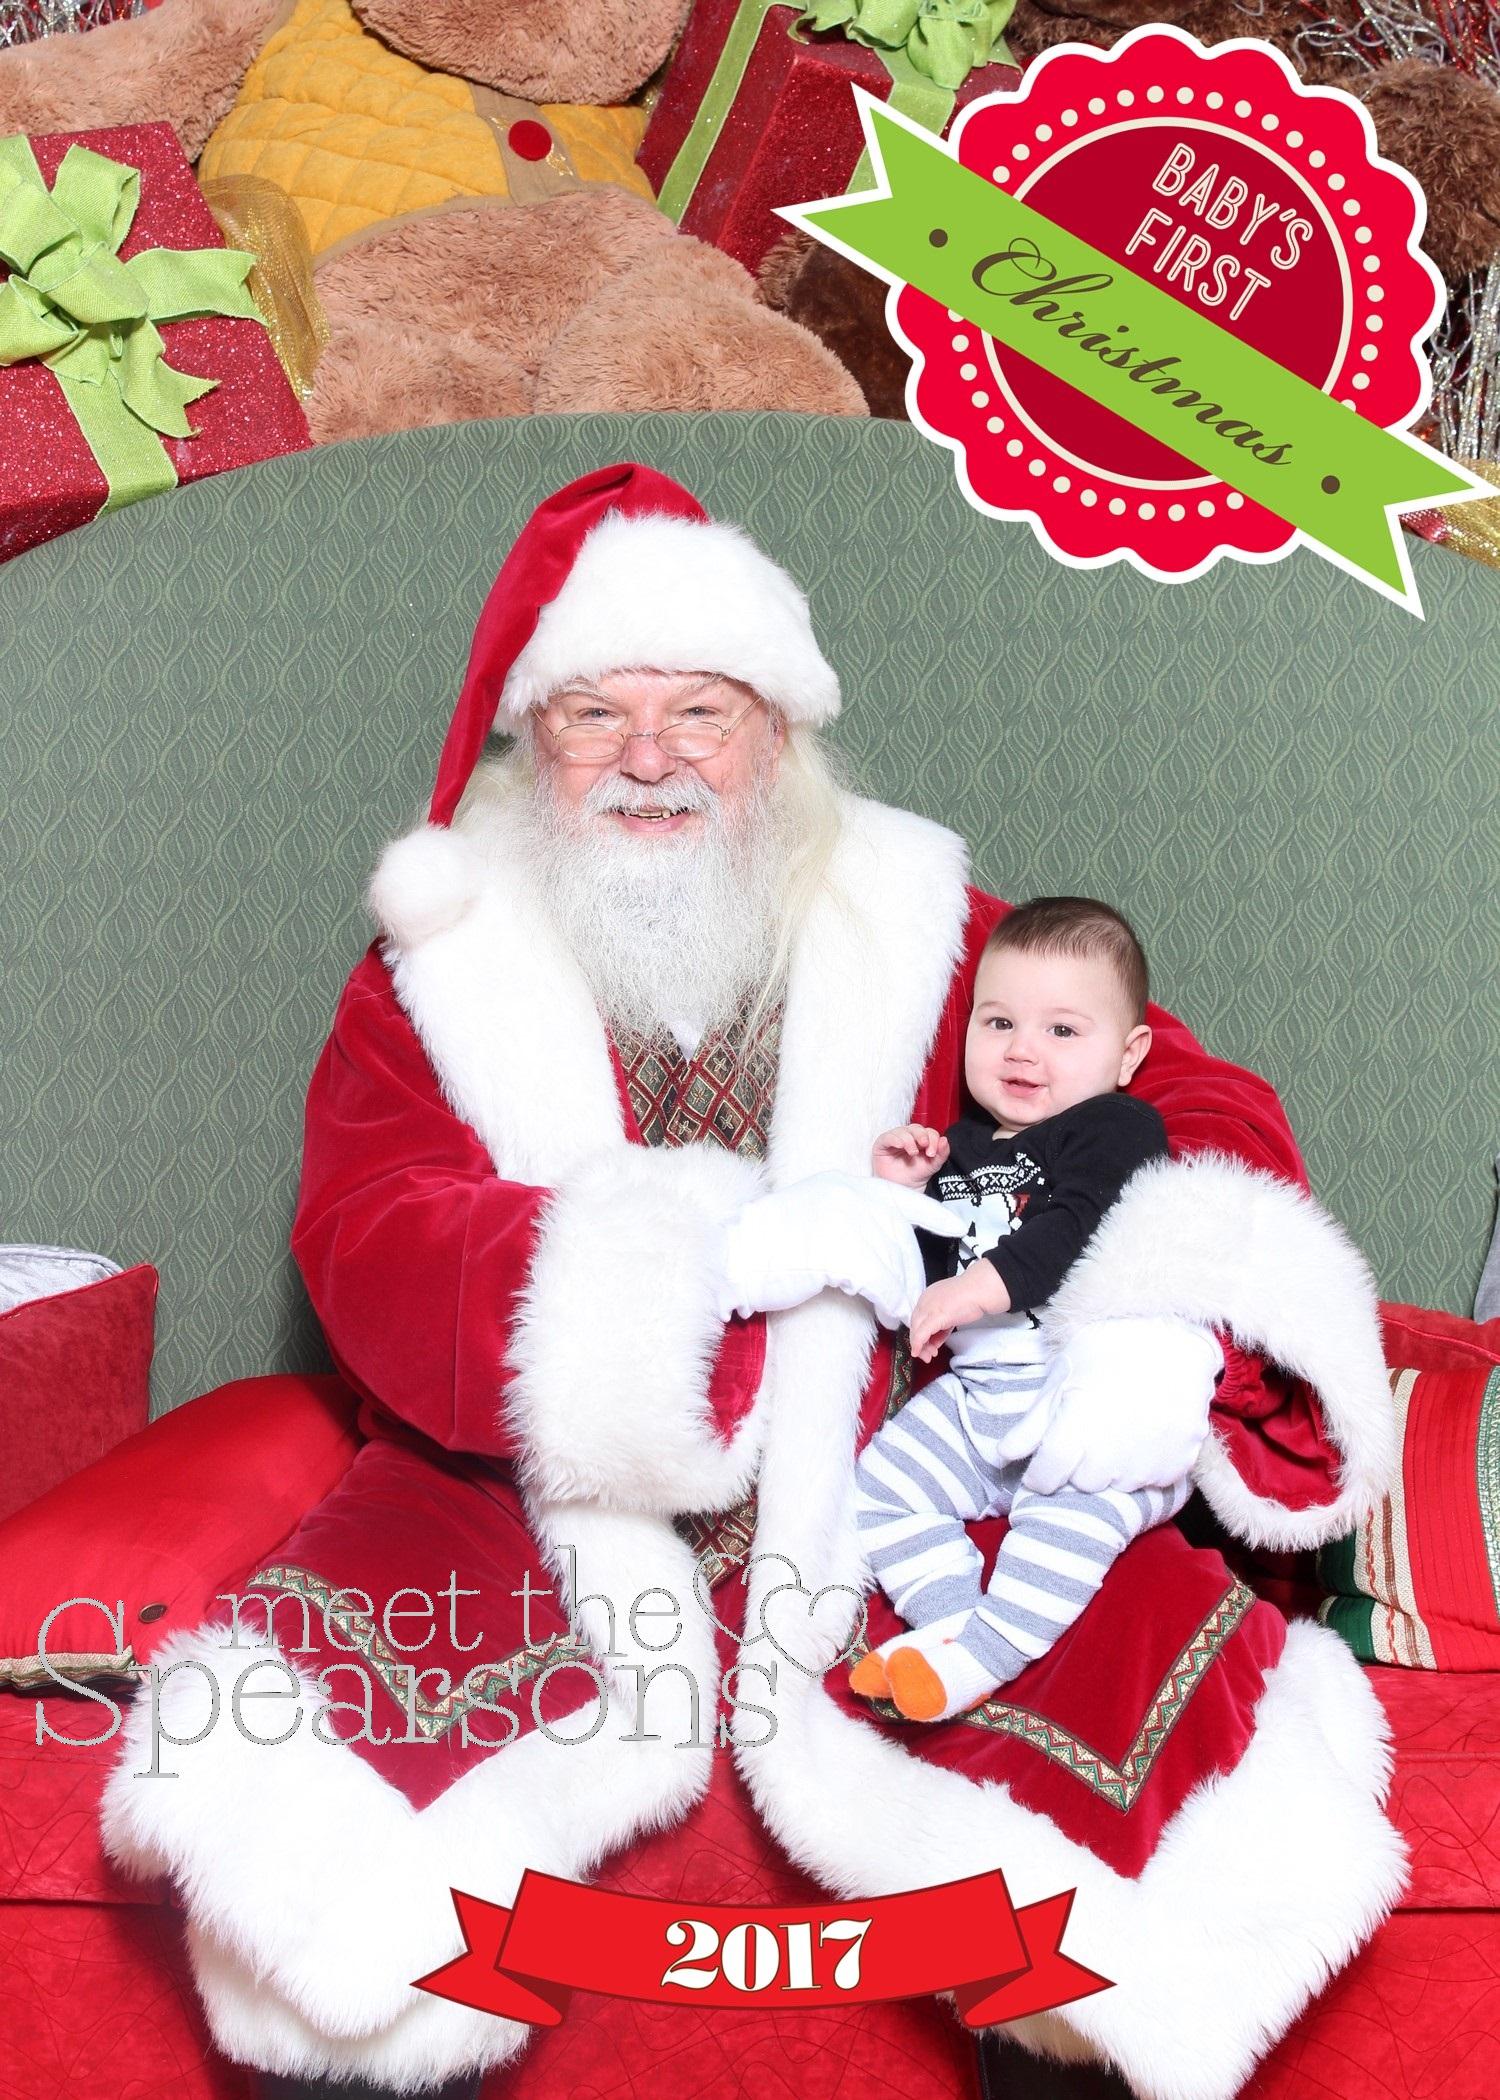 mall santa baby first christmas